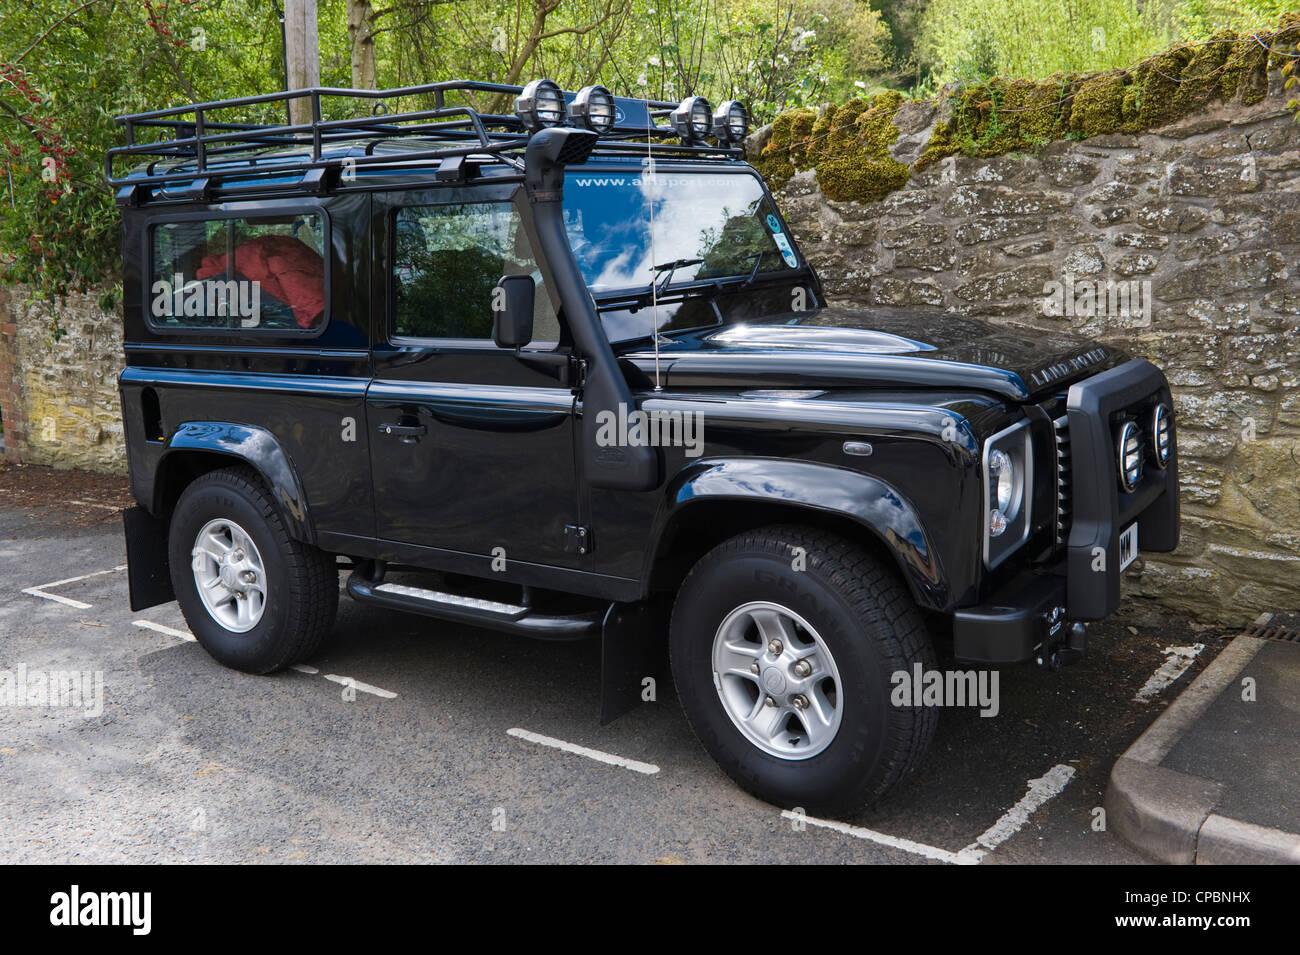 Black Land Rover Defender 90 2 4tdci 4x4 With Safari